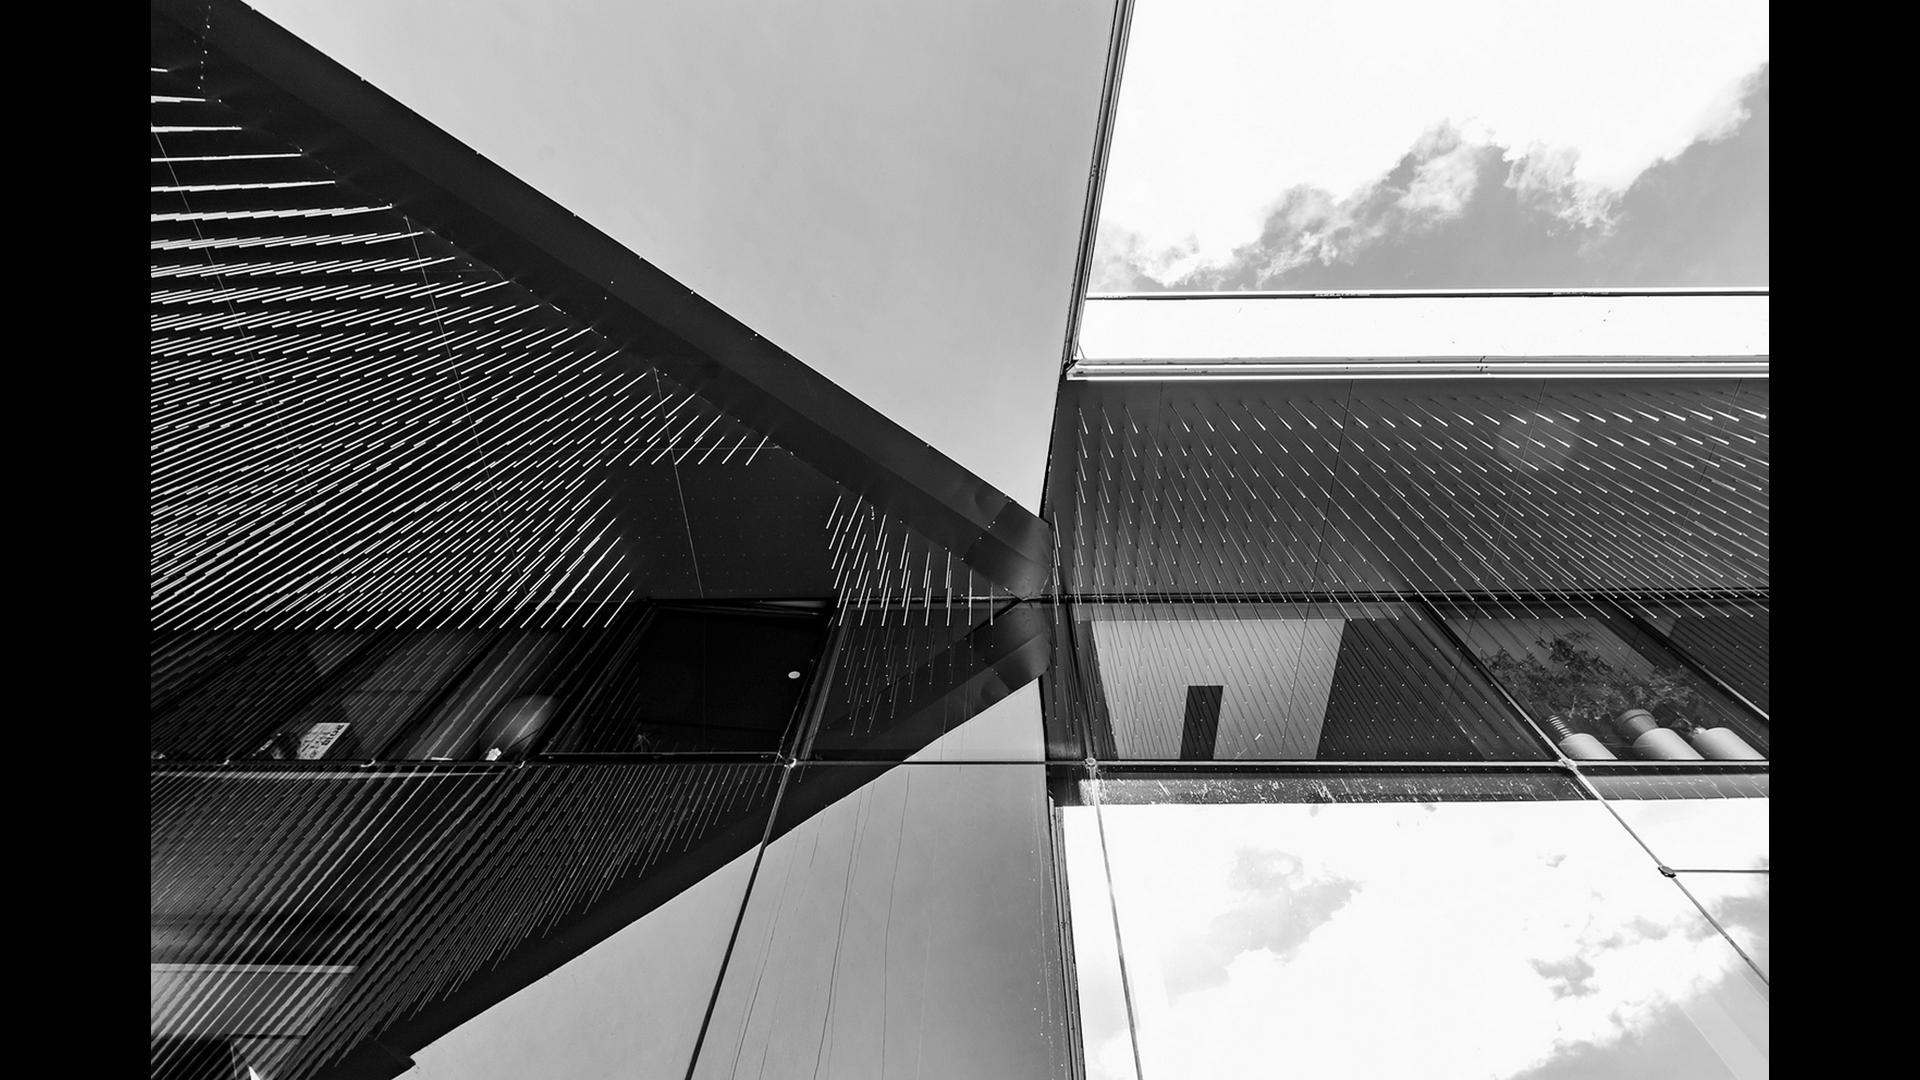 Architecture | Photographer: Rudy PilarskiCurator: Steven Inglima